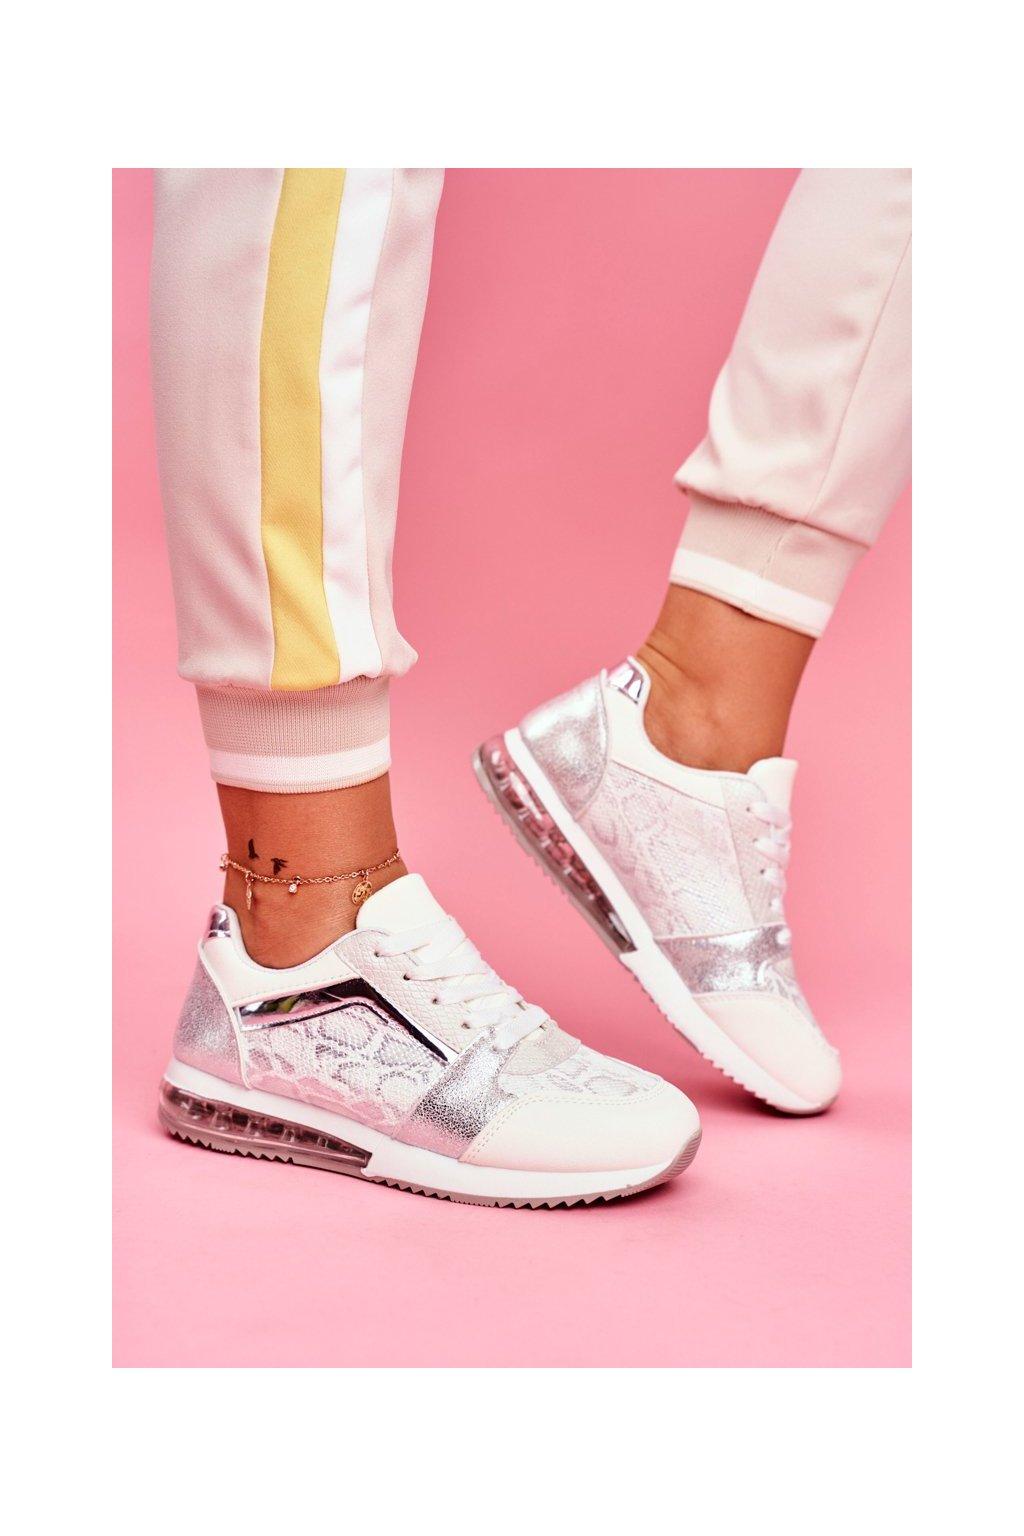 Dámska športová obuv Sneakers biela Helly